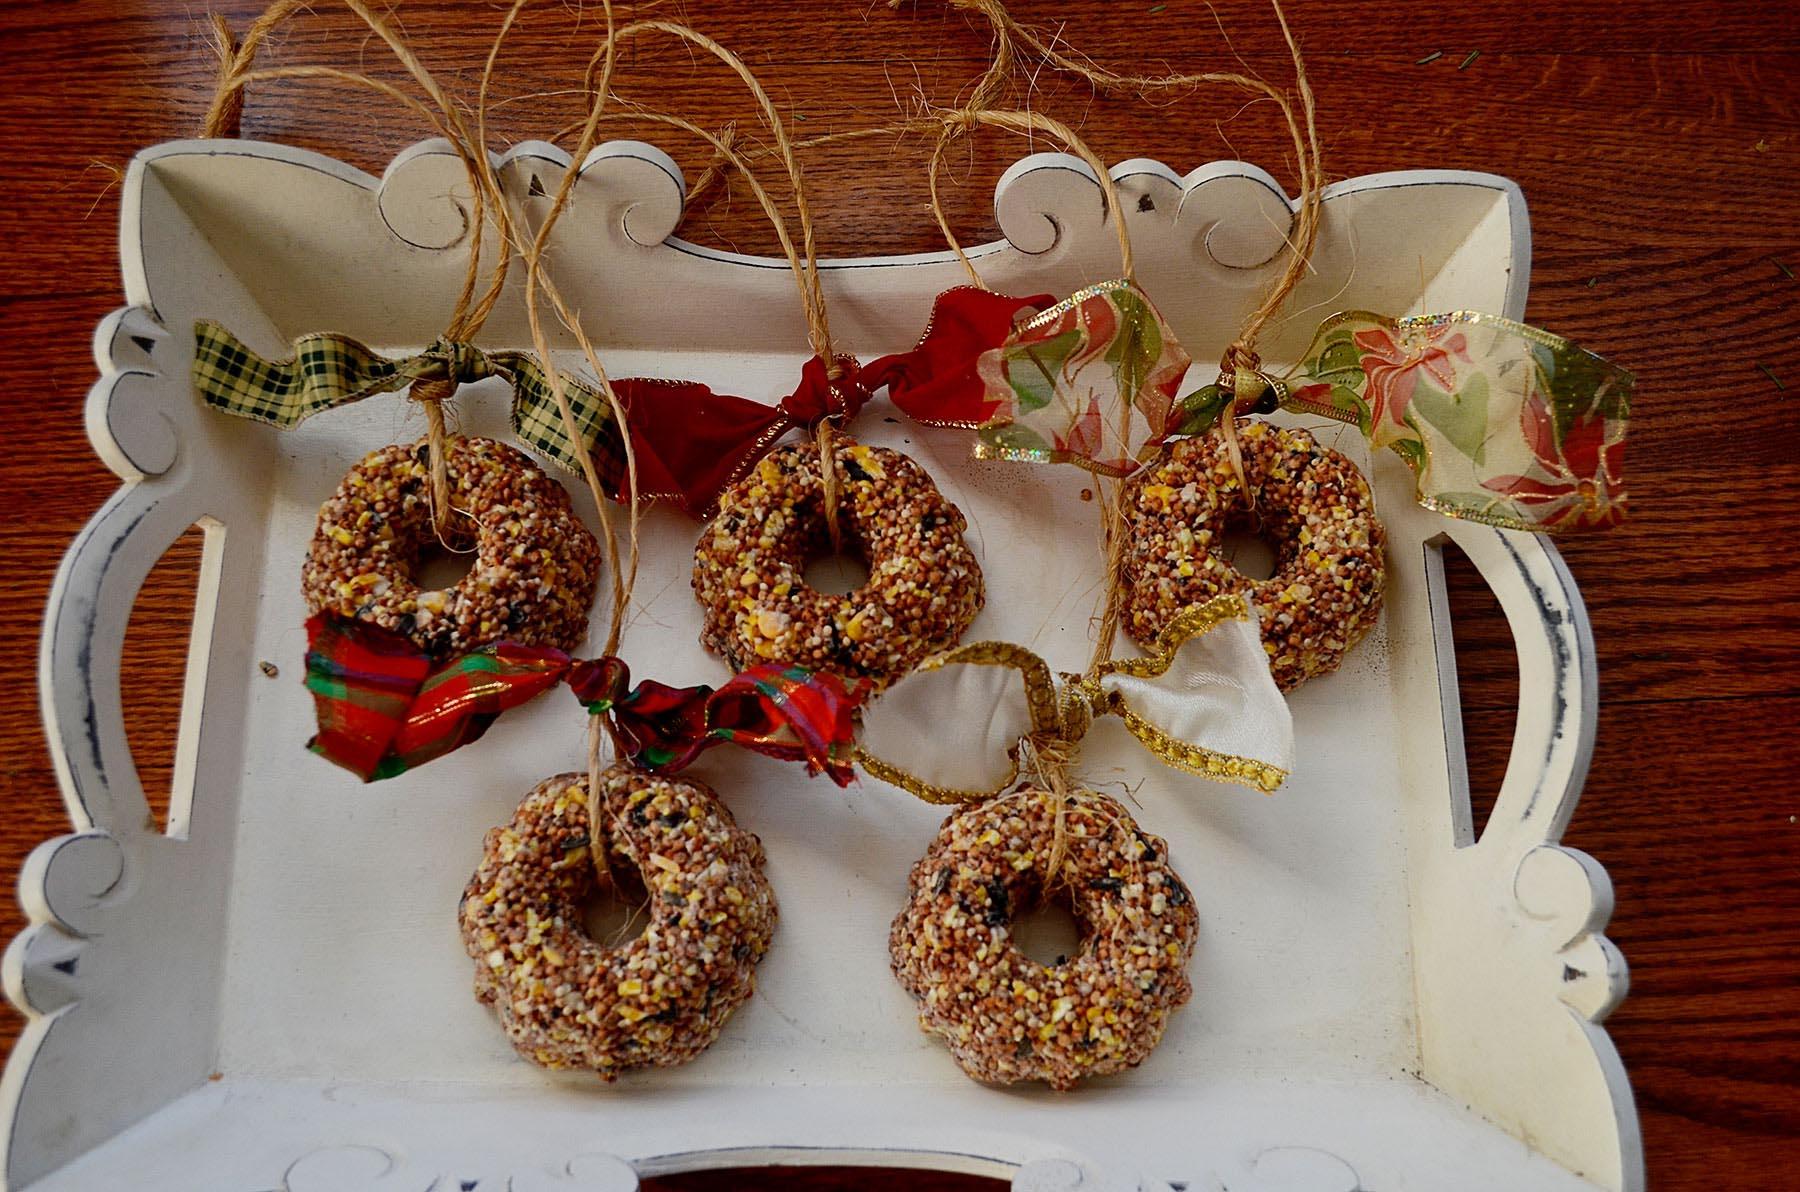 Homemade Bird Seed Ornaments